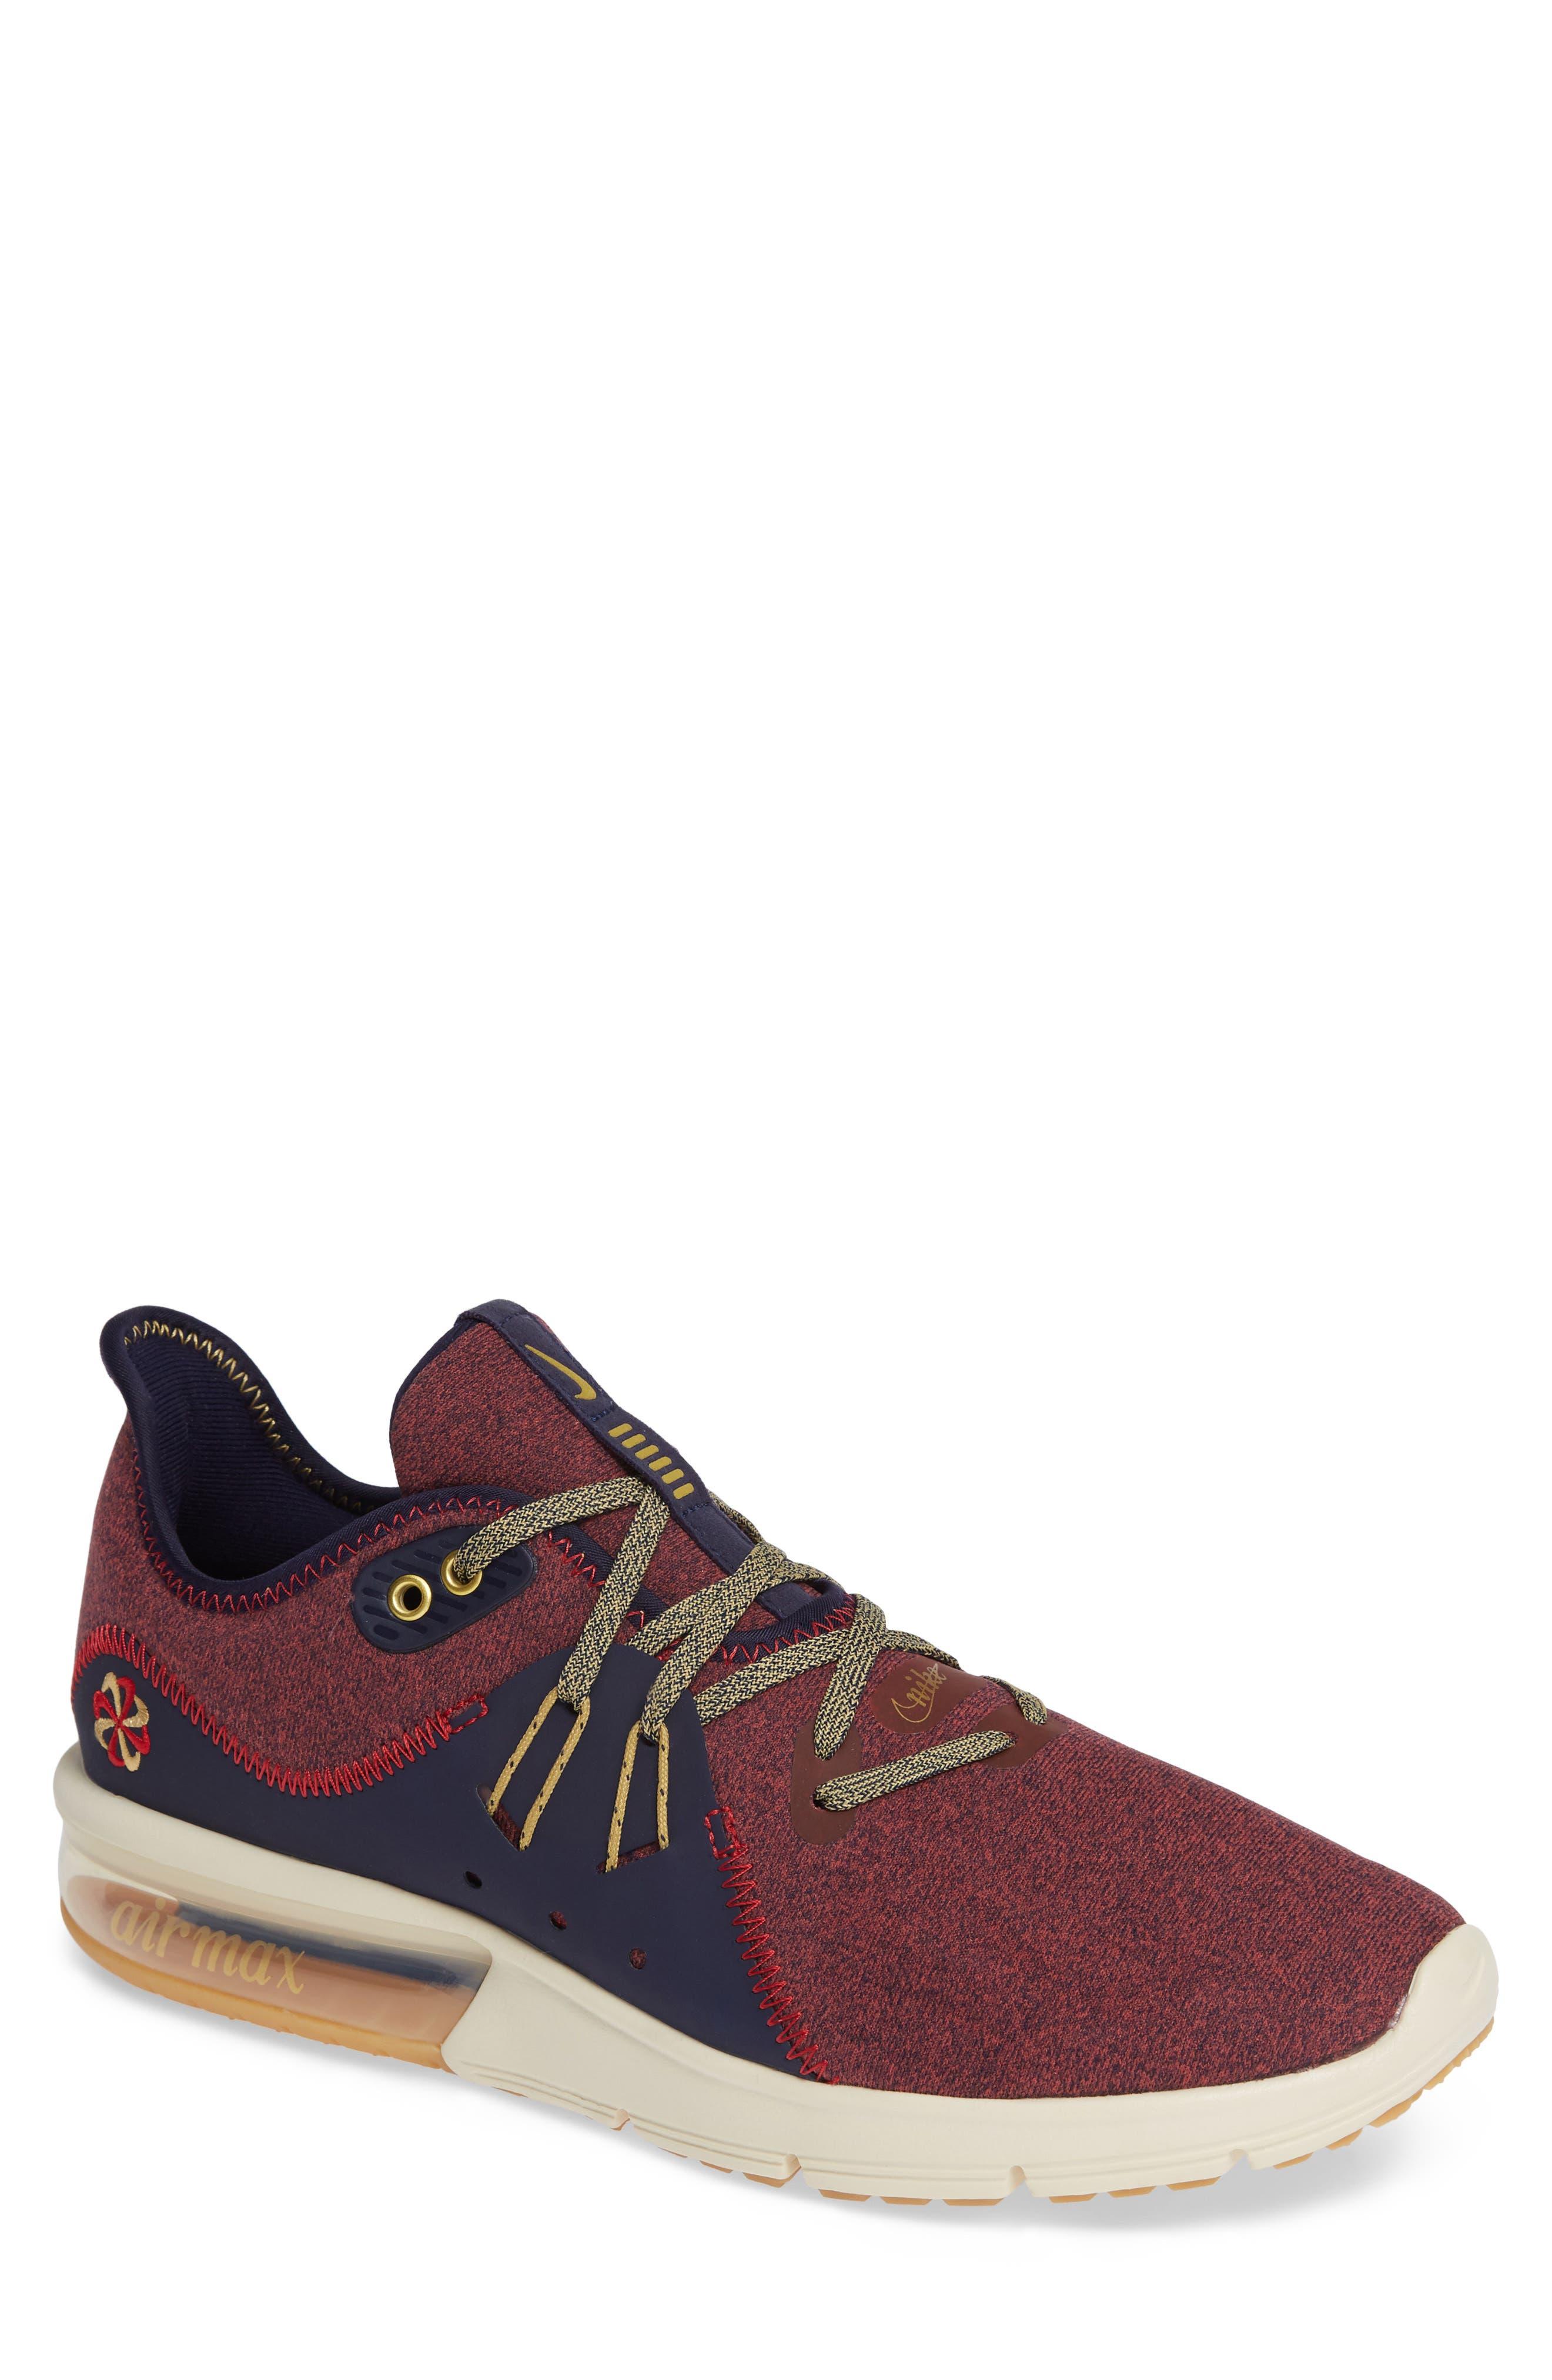 Air Max Sequent 3 PRM VST Sneaker,                         Main,                         color, 600